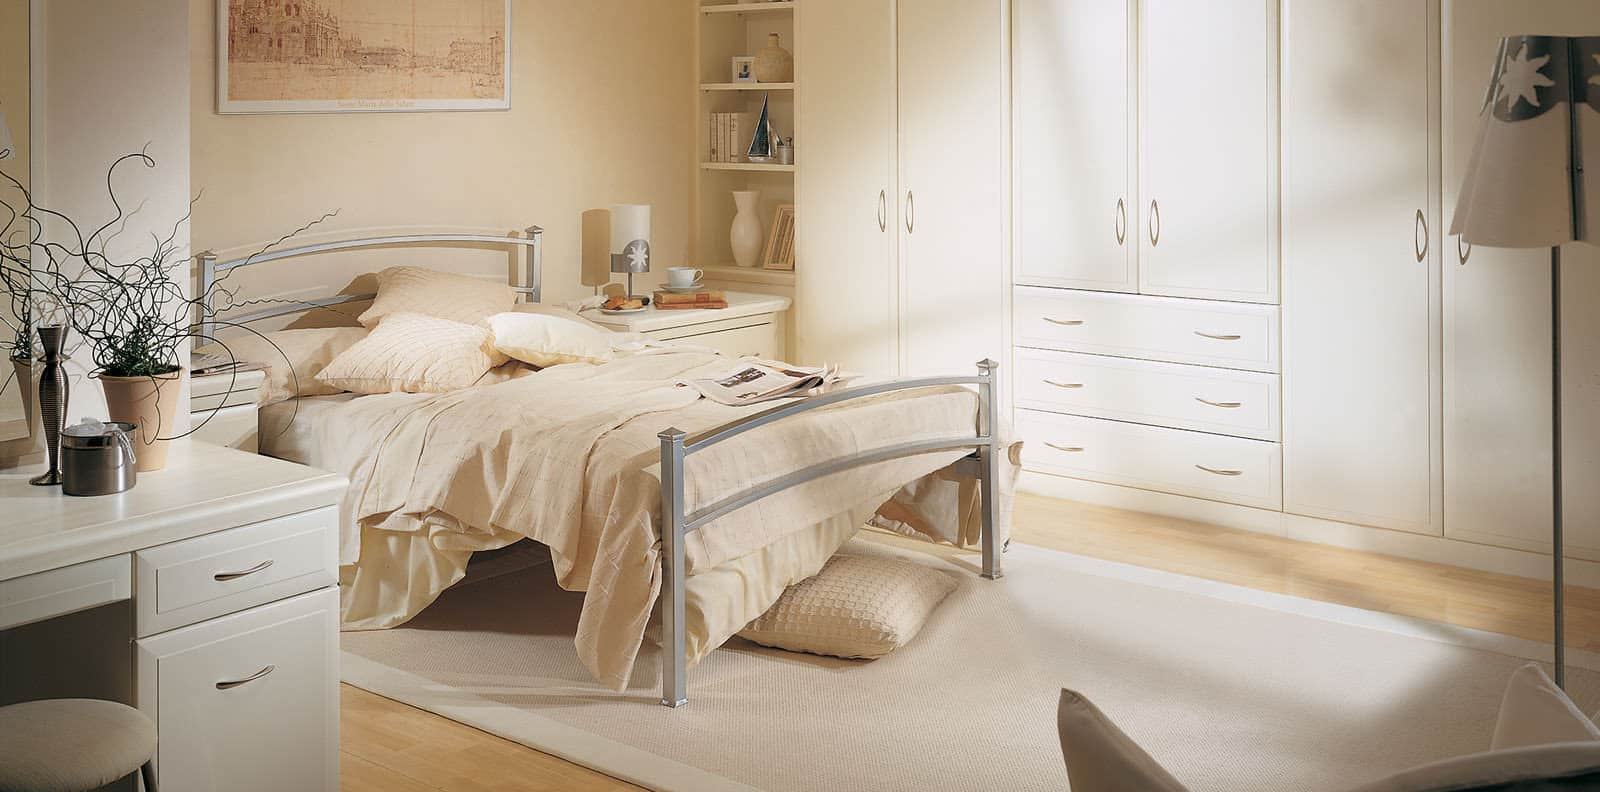 luxury fitted bedroom furniture & wardrobesstrachan